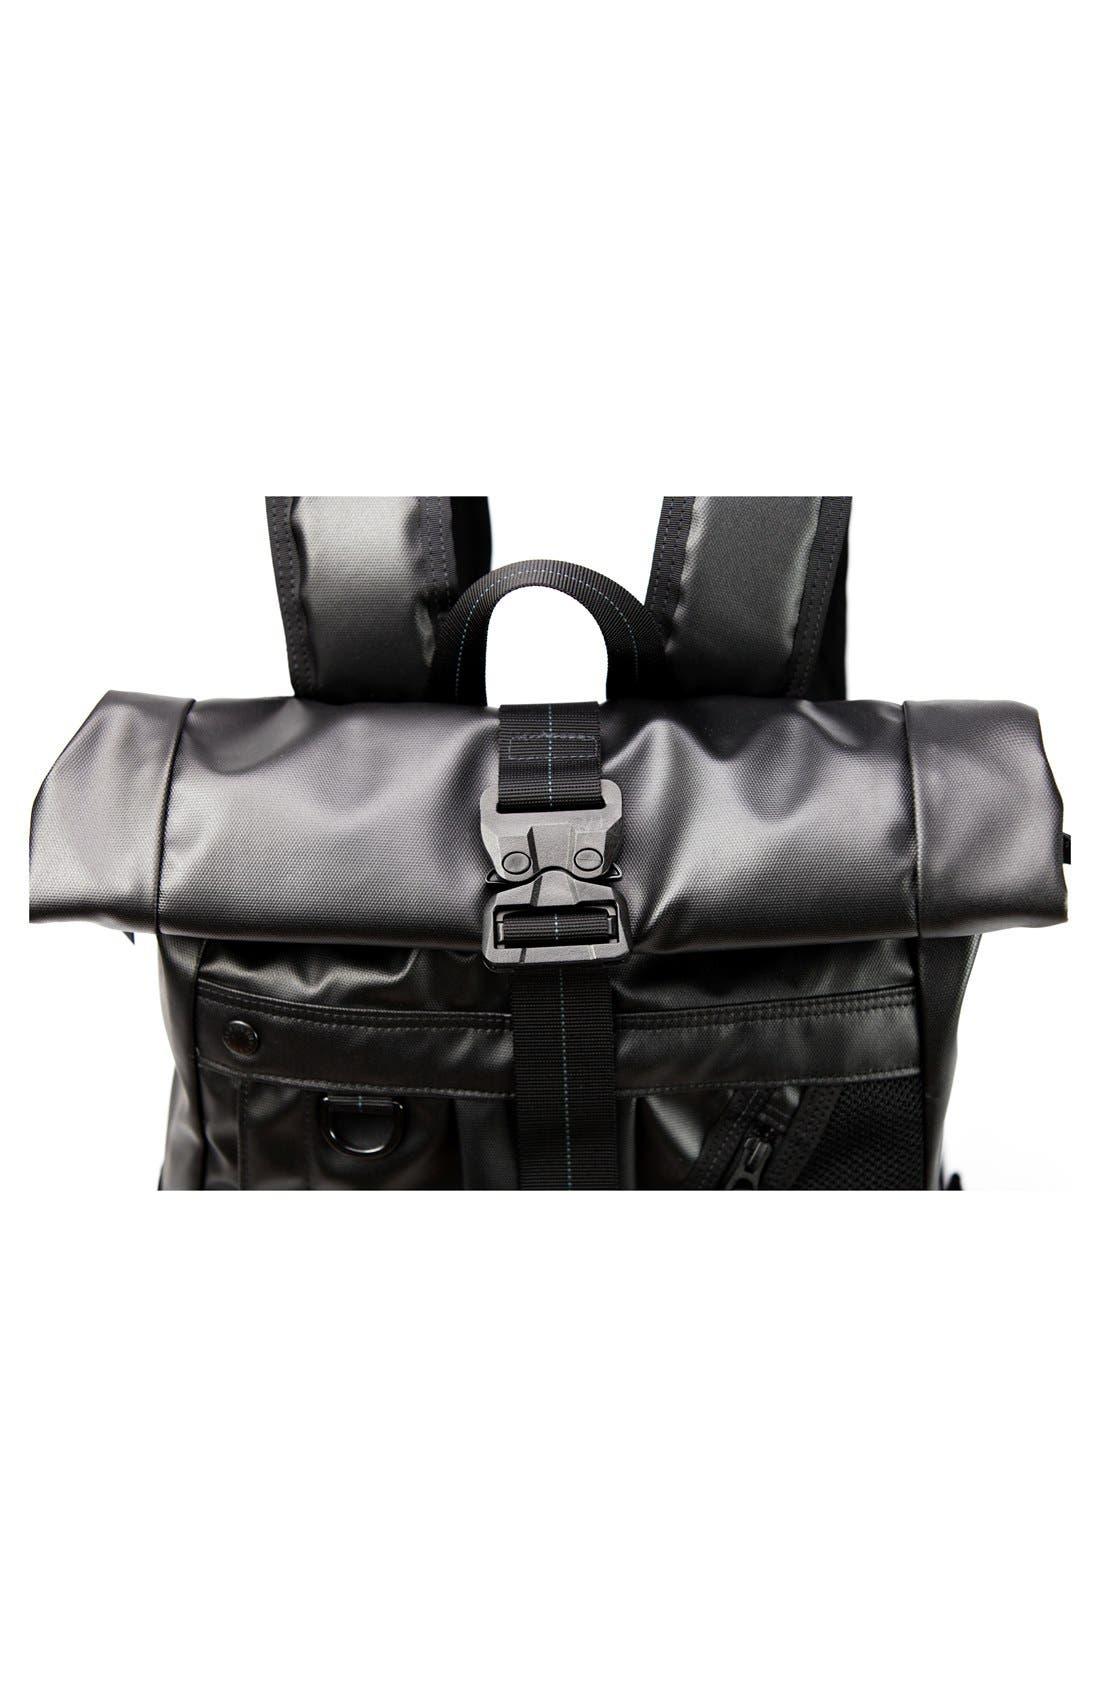 NightHawk Roll Top Backpack,                             Alternate thumbnail 2, color,                             BLACK